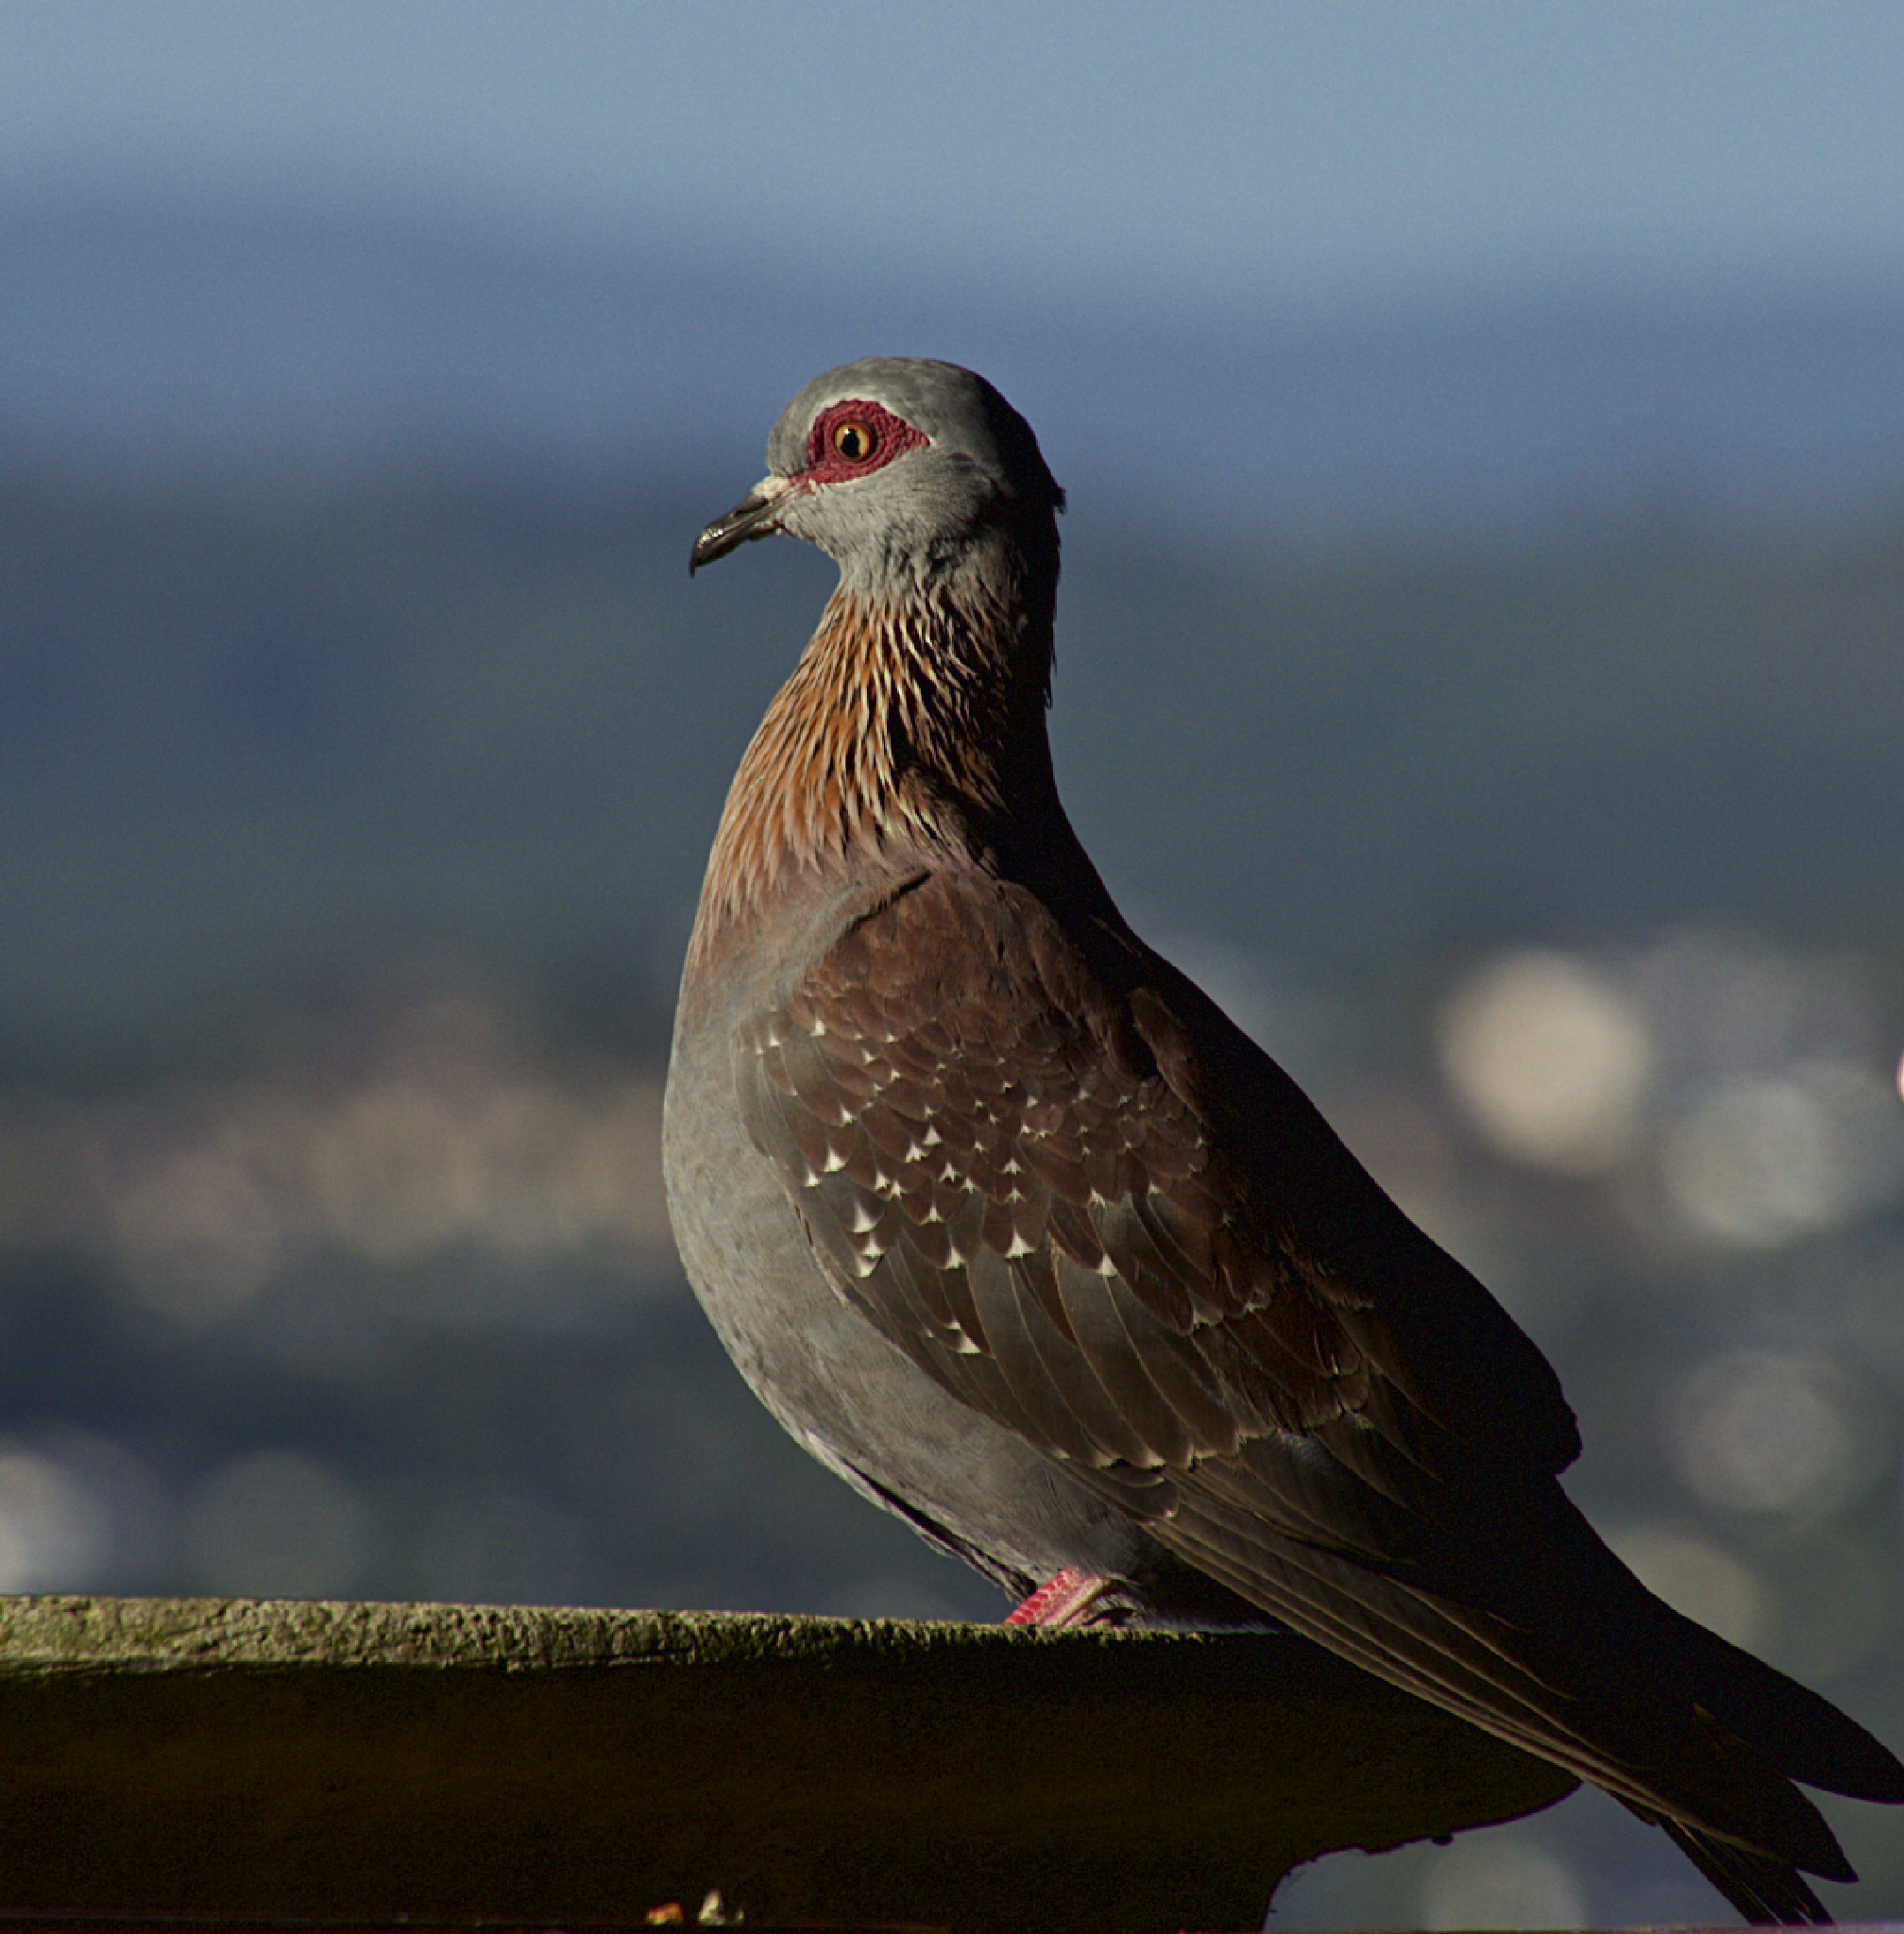 Pigeon by sandybrady